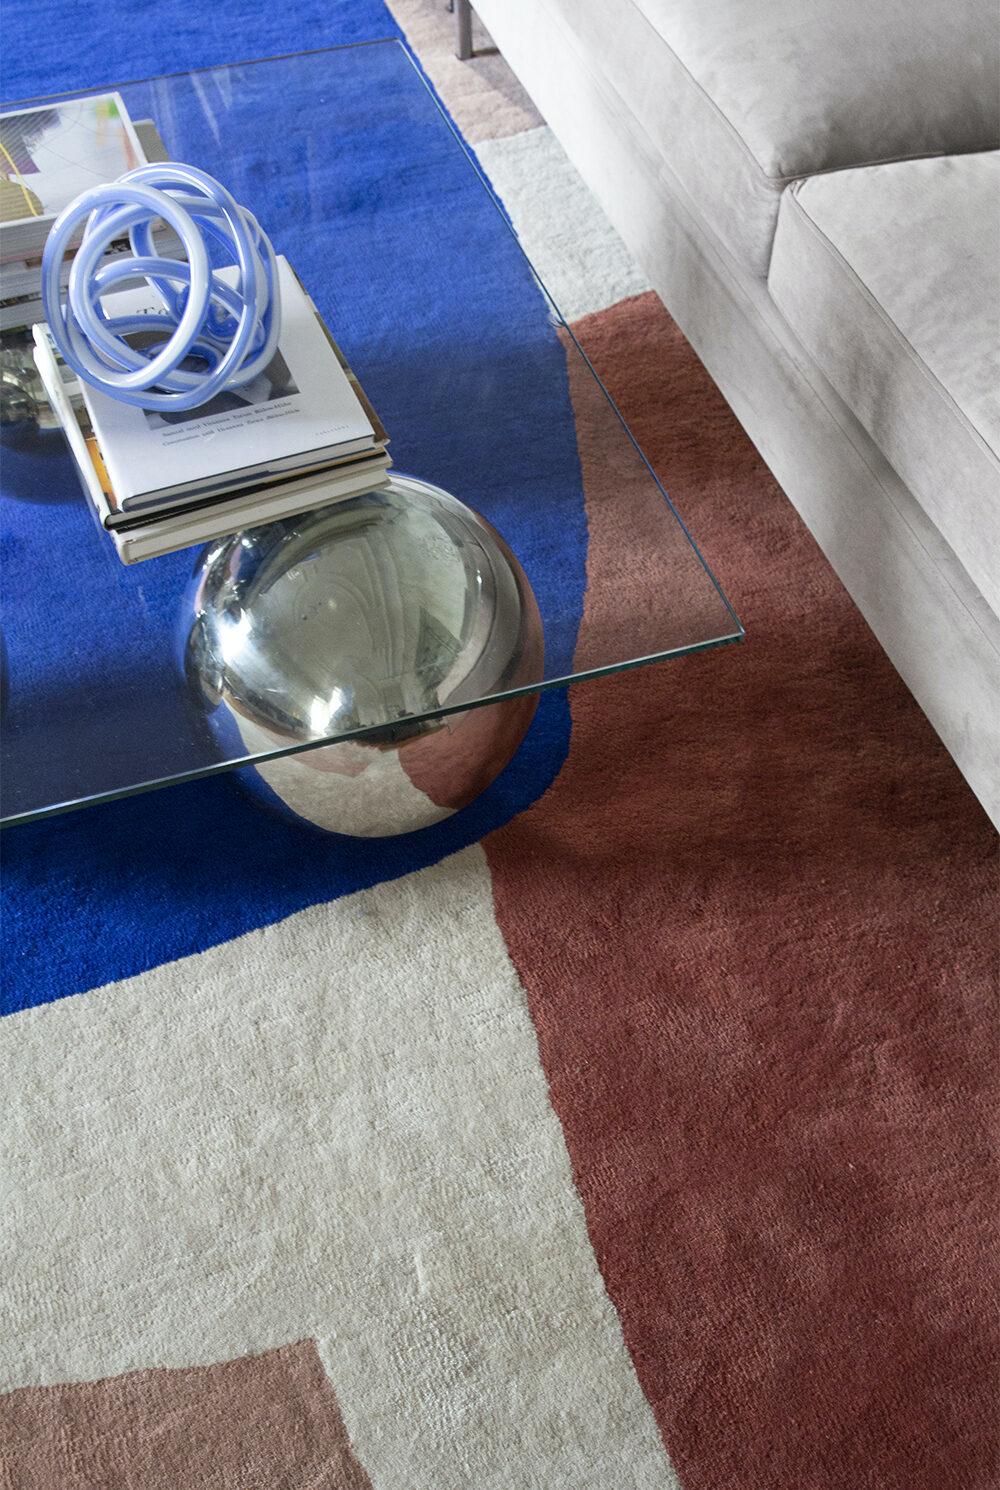 Upptäck Layereds nya mattor i skandinavisk stil